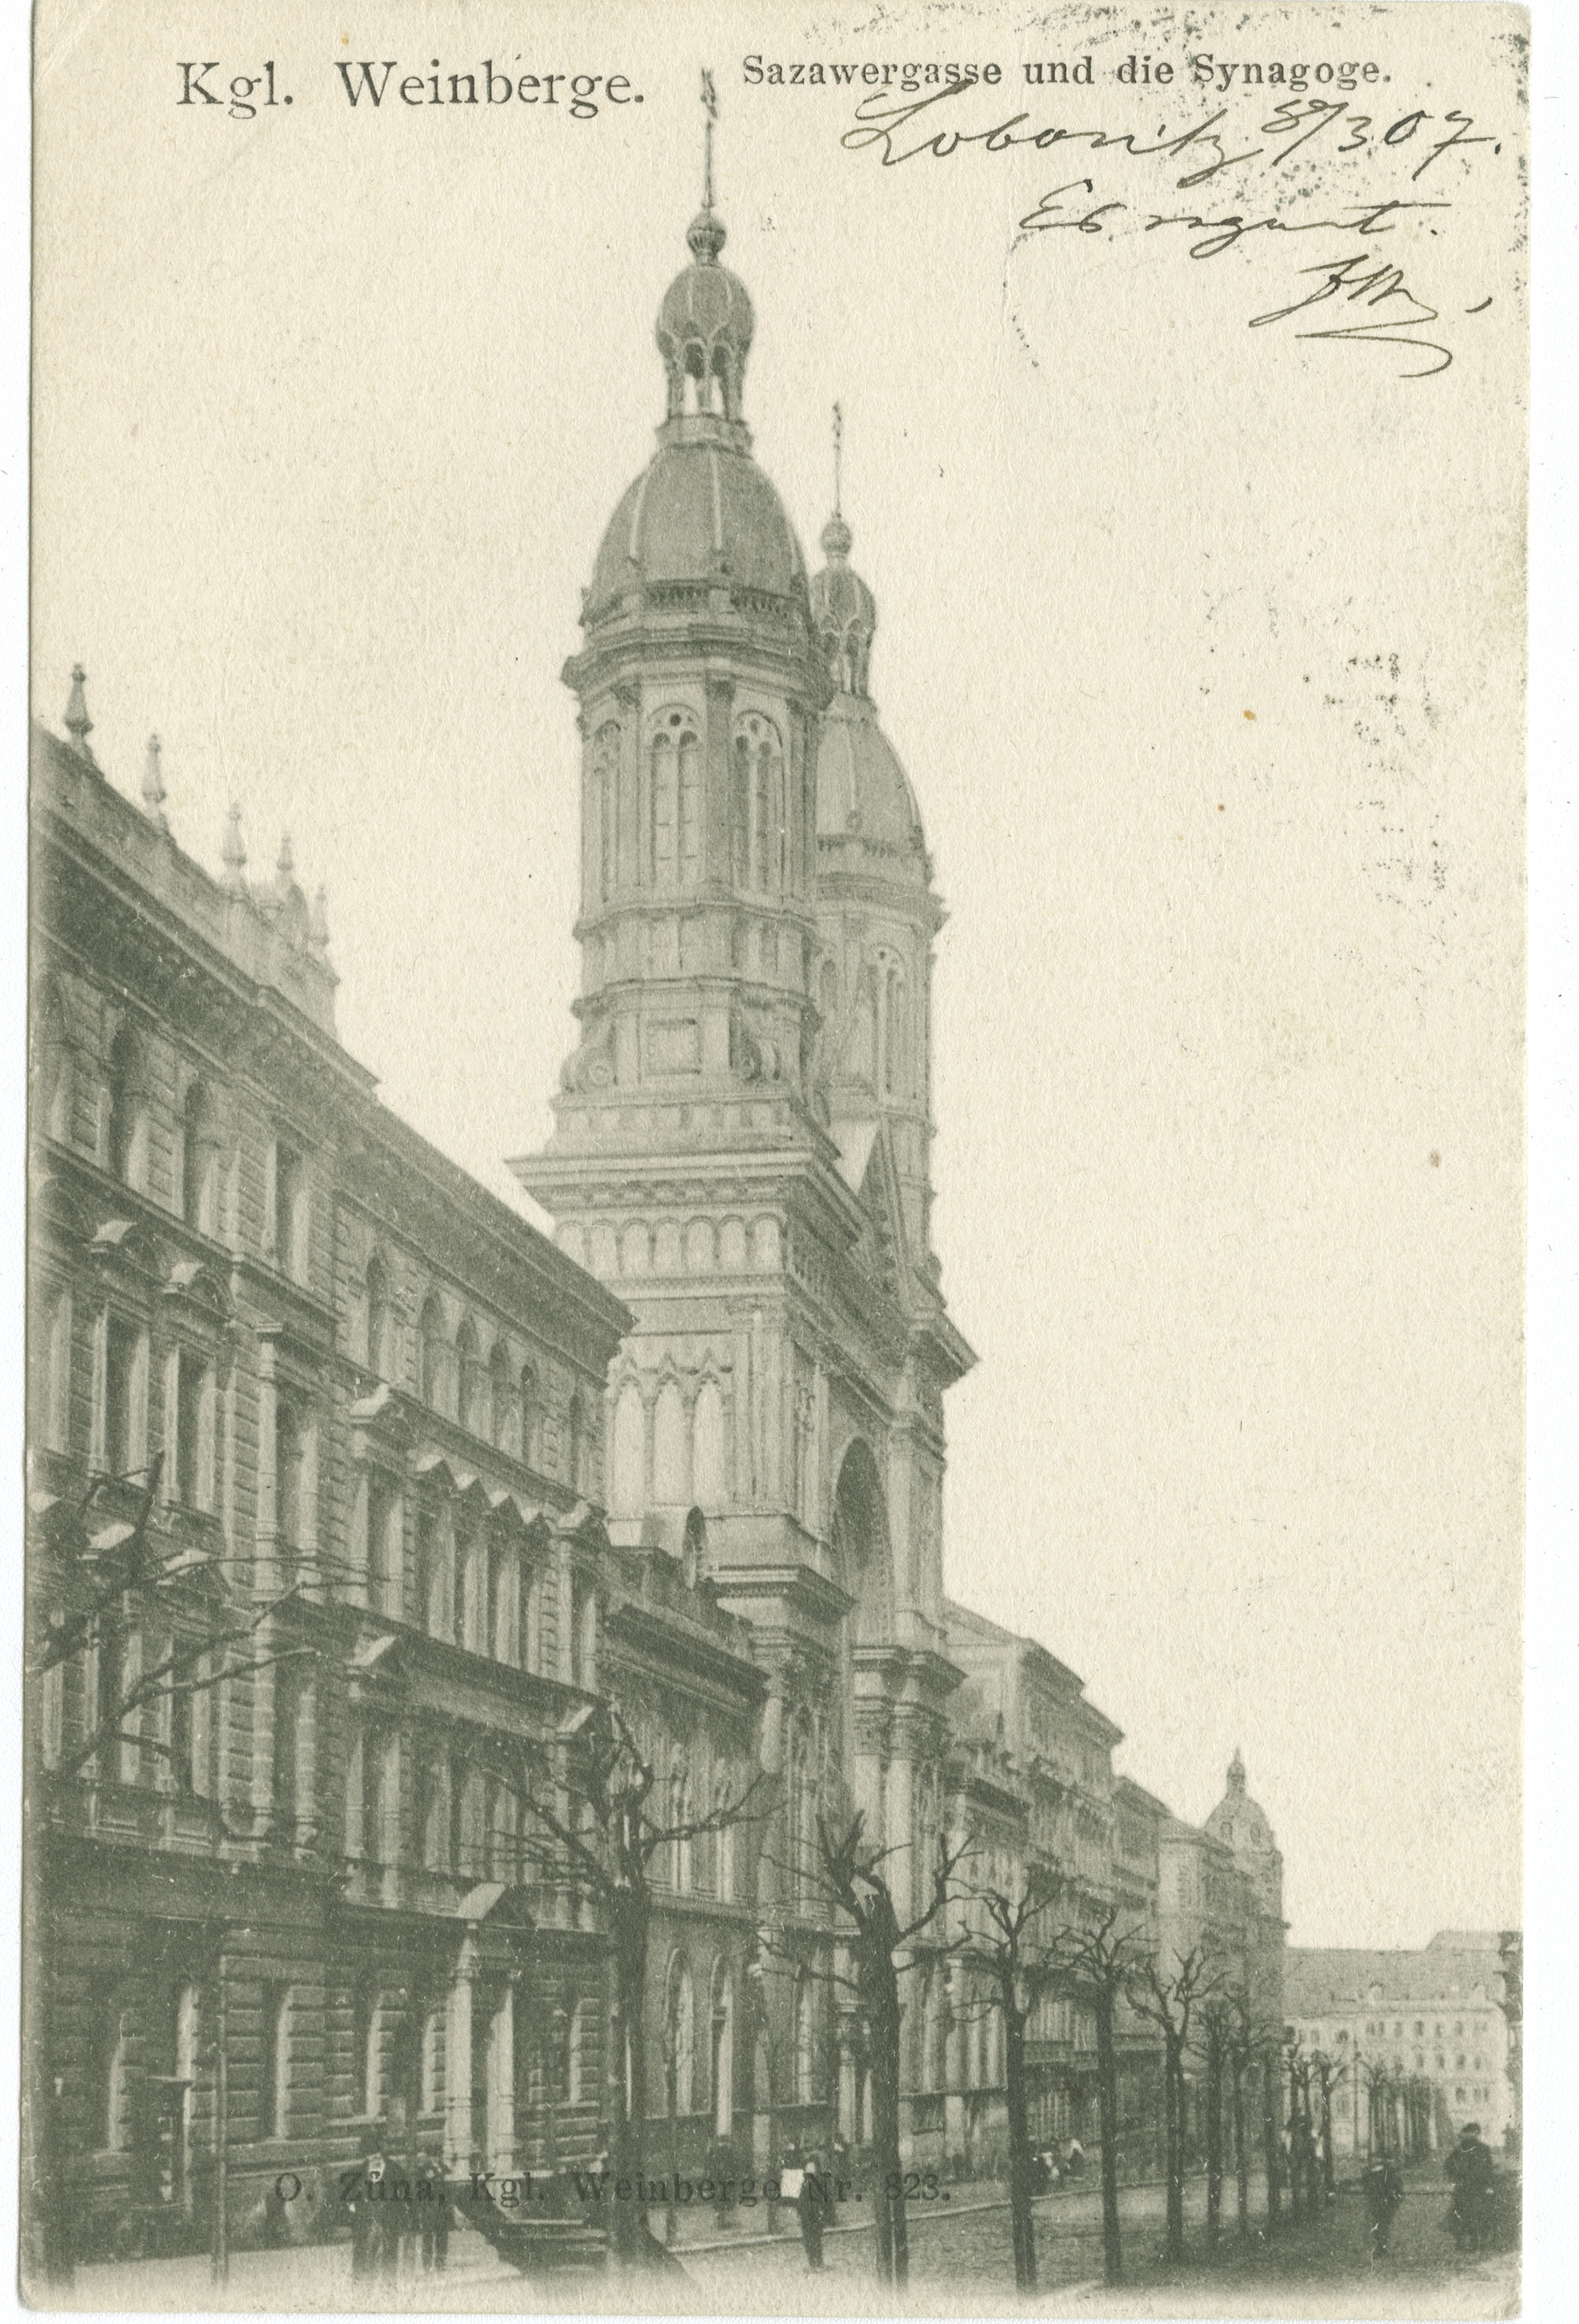 Kgl. Weinberge. Sazawergasse und die Synagoge.